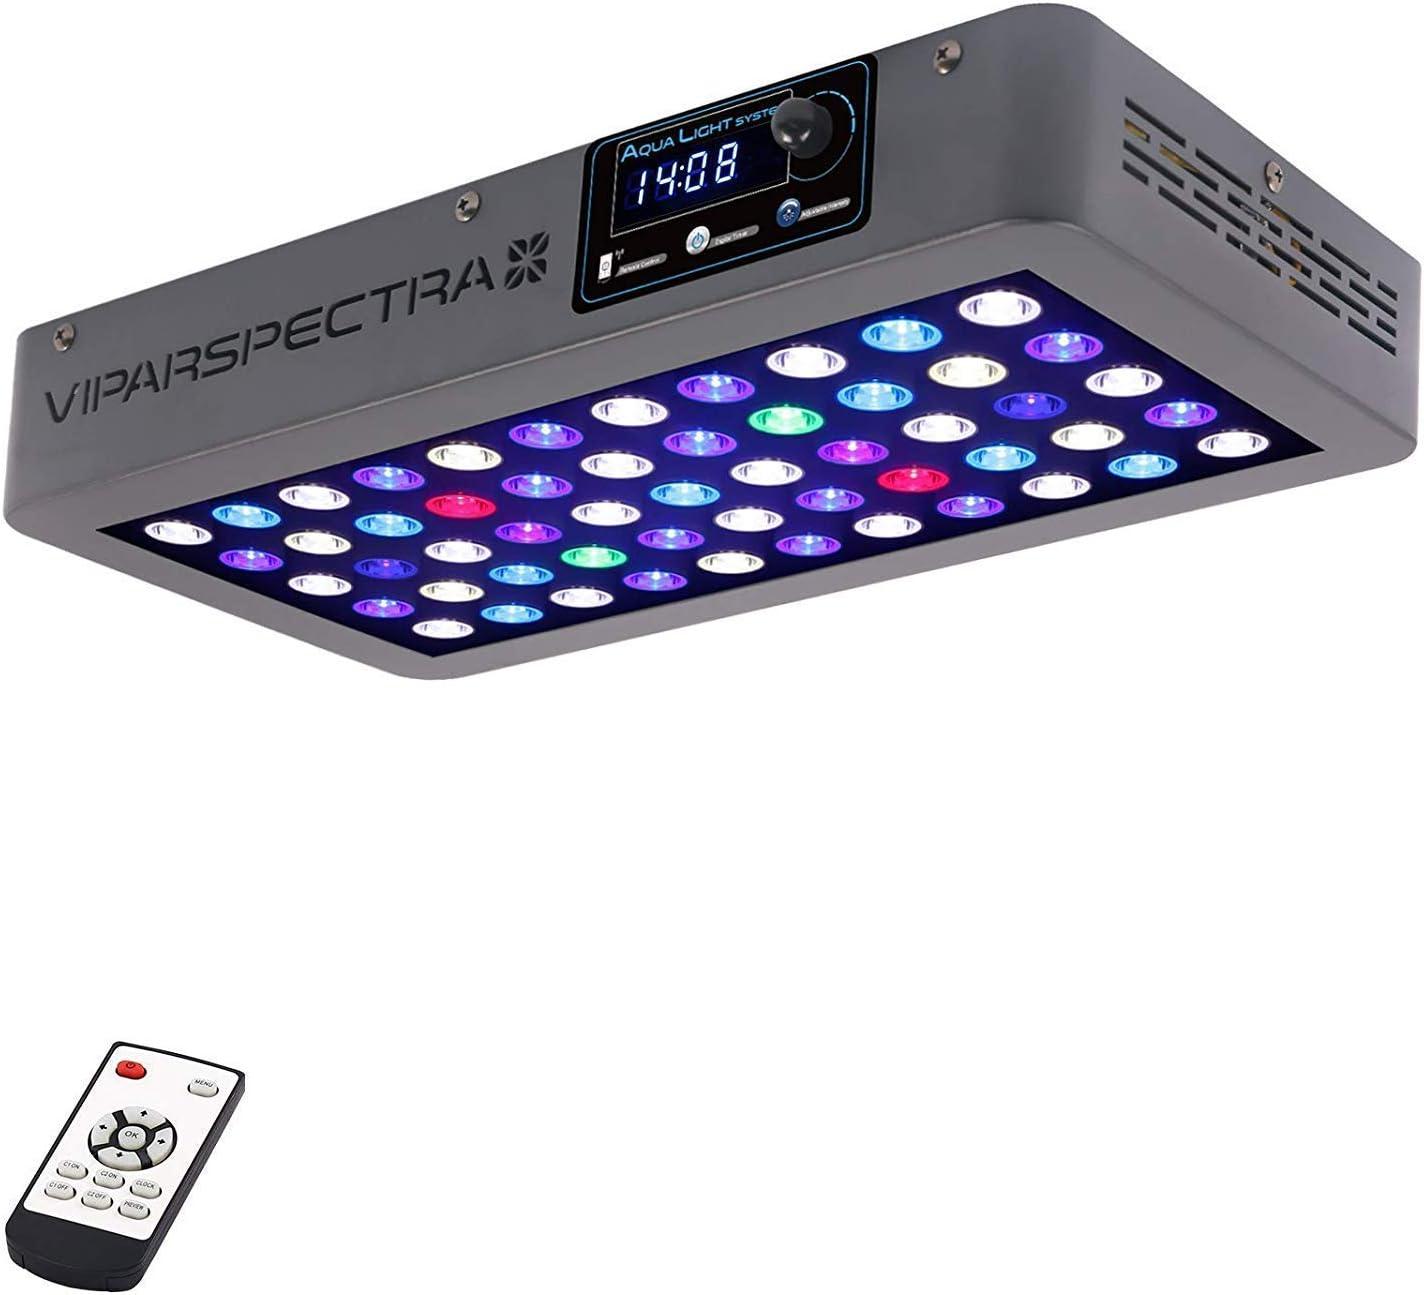 Viparspectra LED Aquarium Light